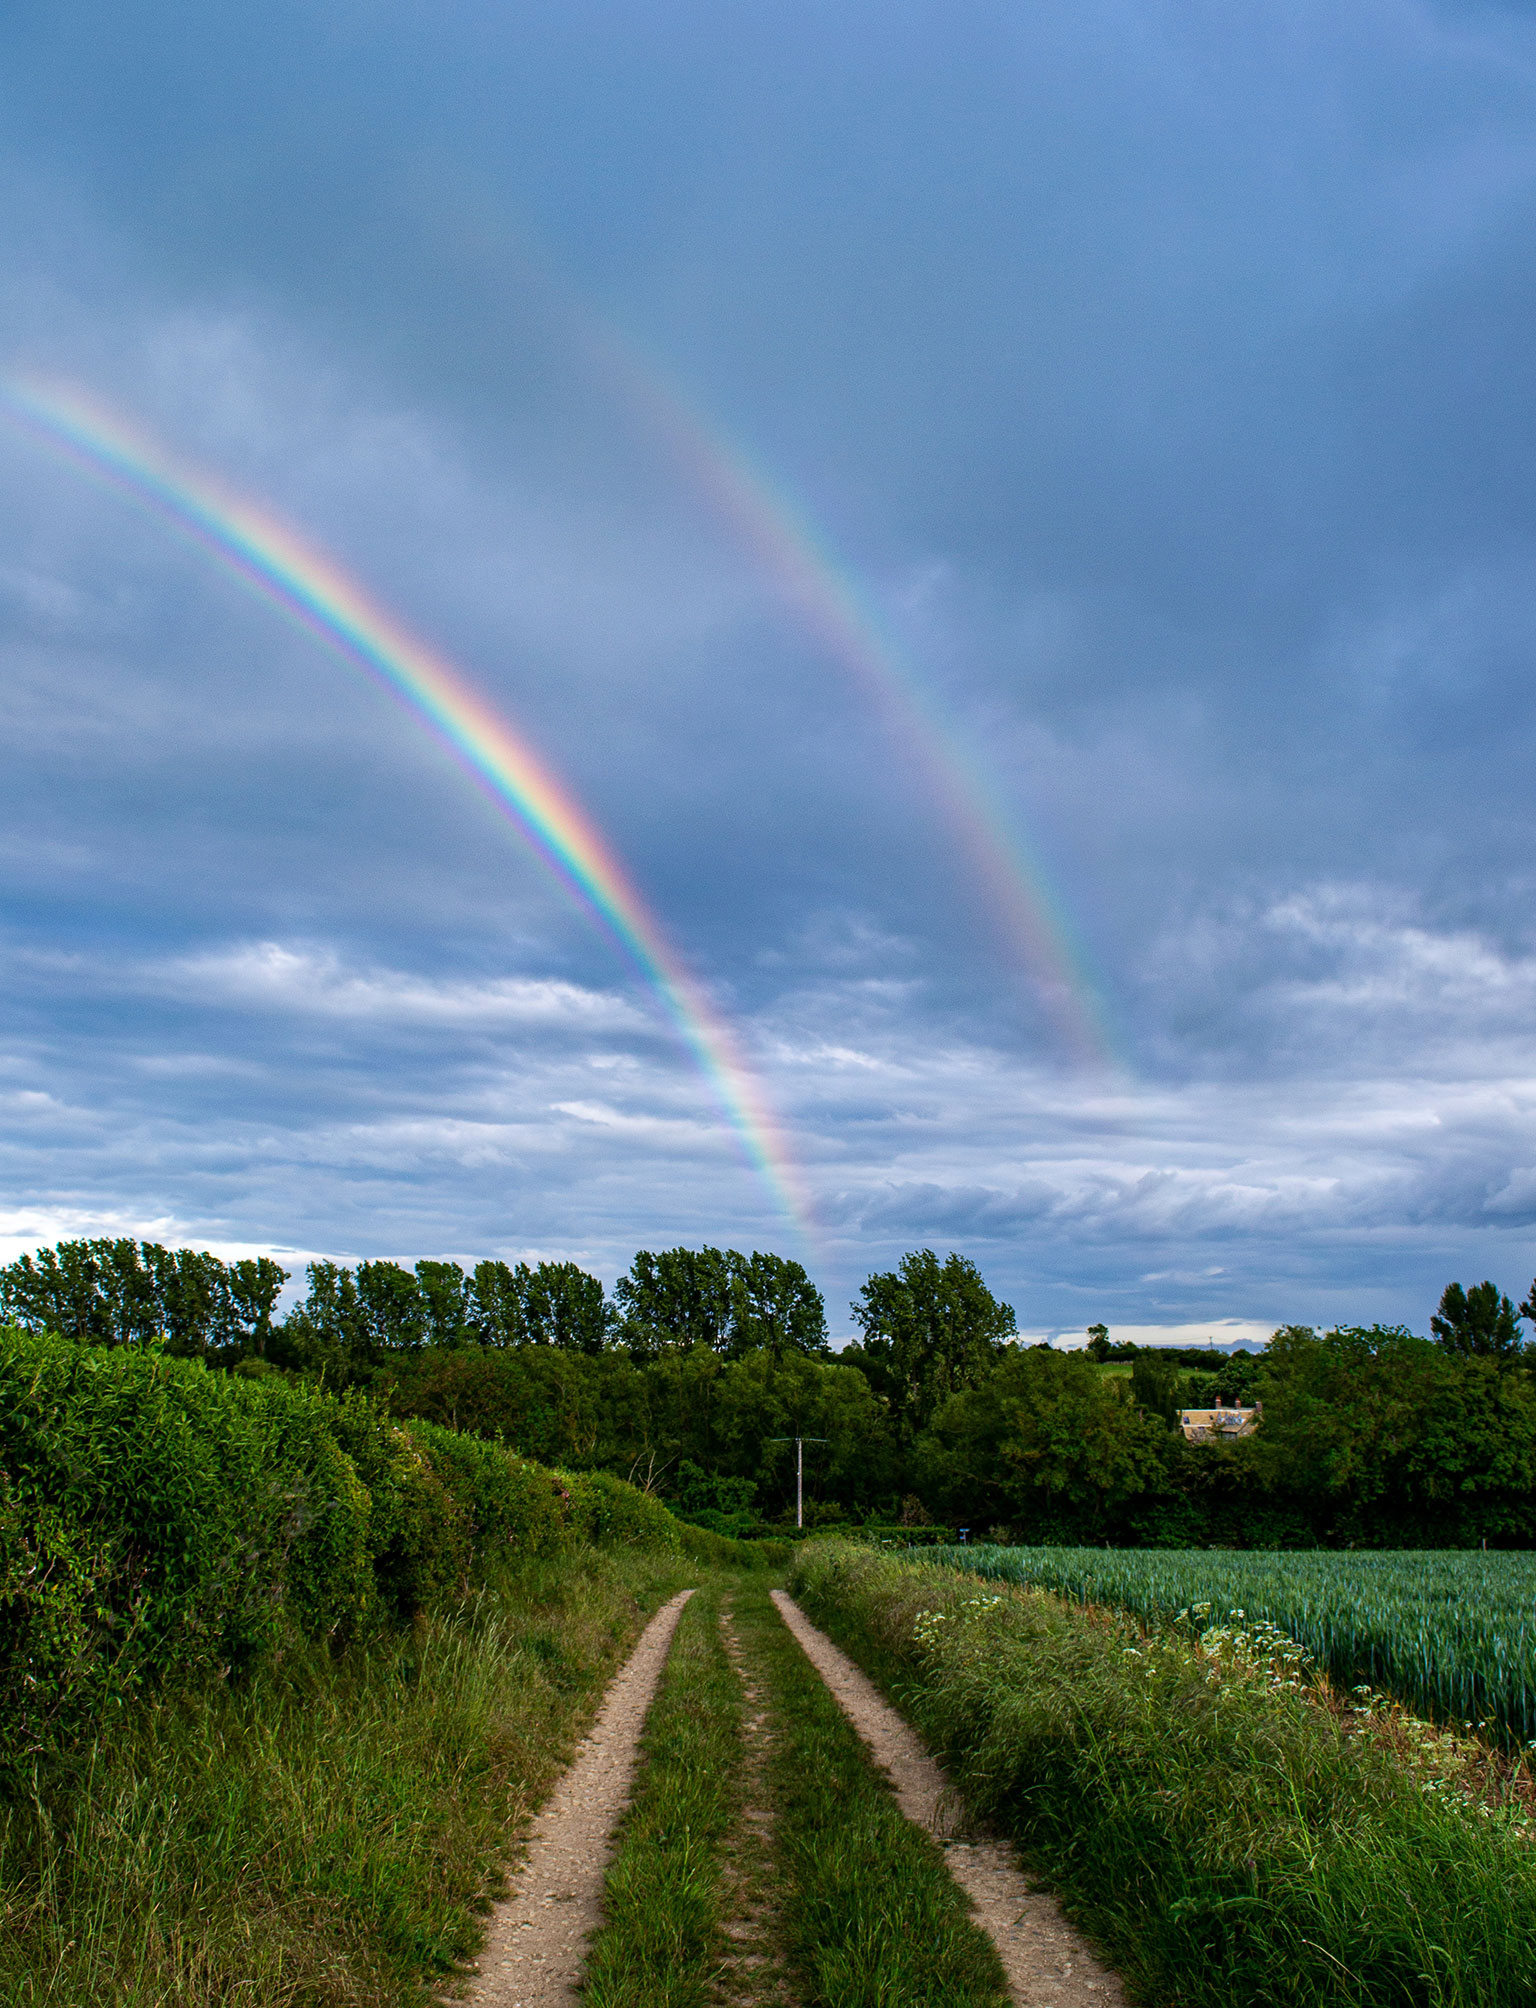 Land-with-rainbow-image